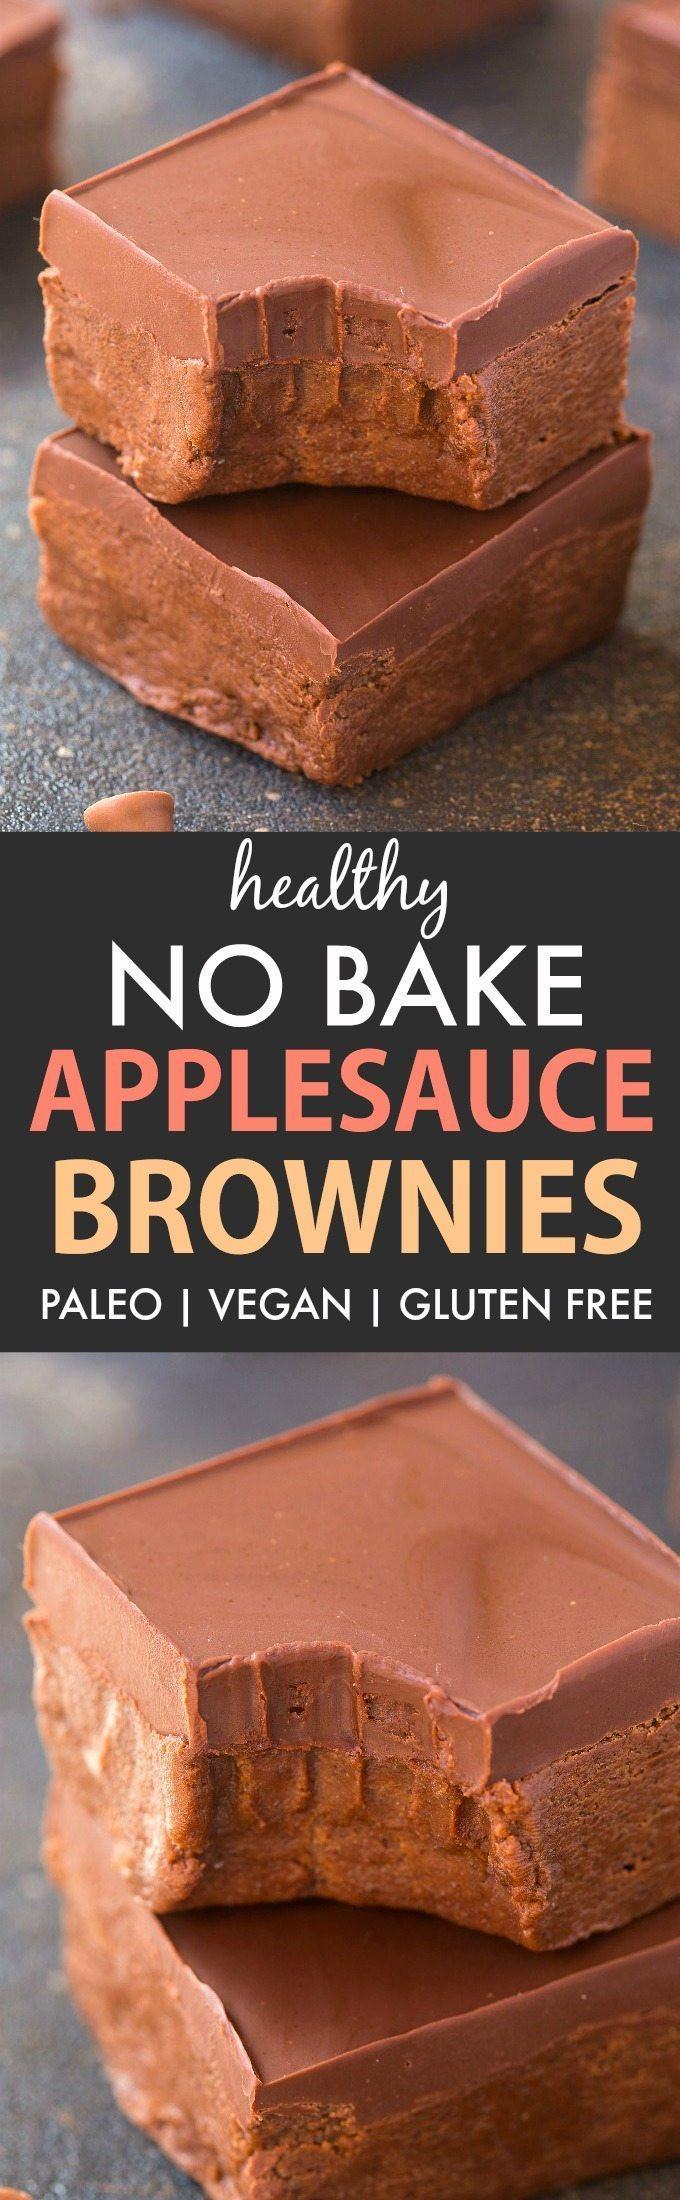 Healthy Brownies With Applesauce  Healthy No Bake Applesauce Brownies Paleo Vegan Gluten